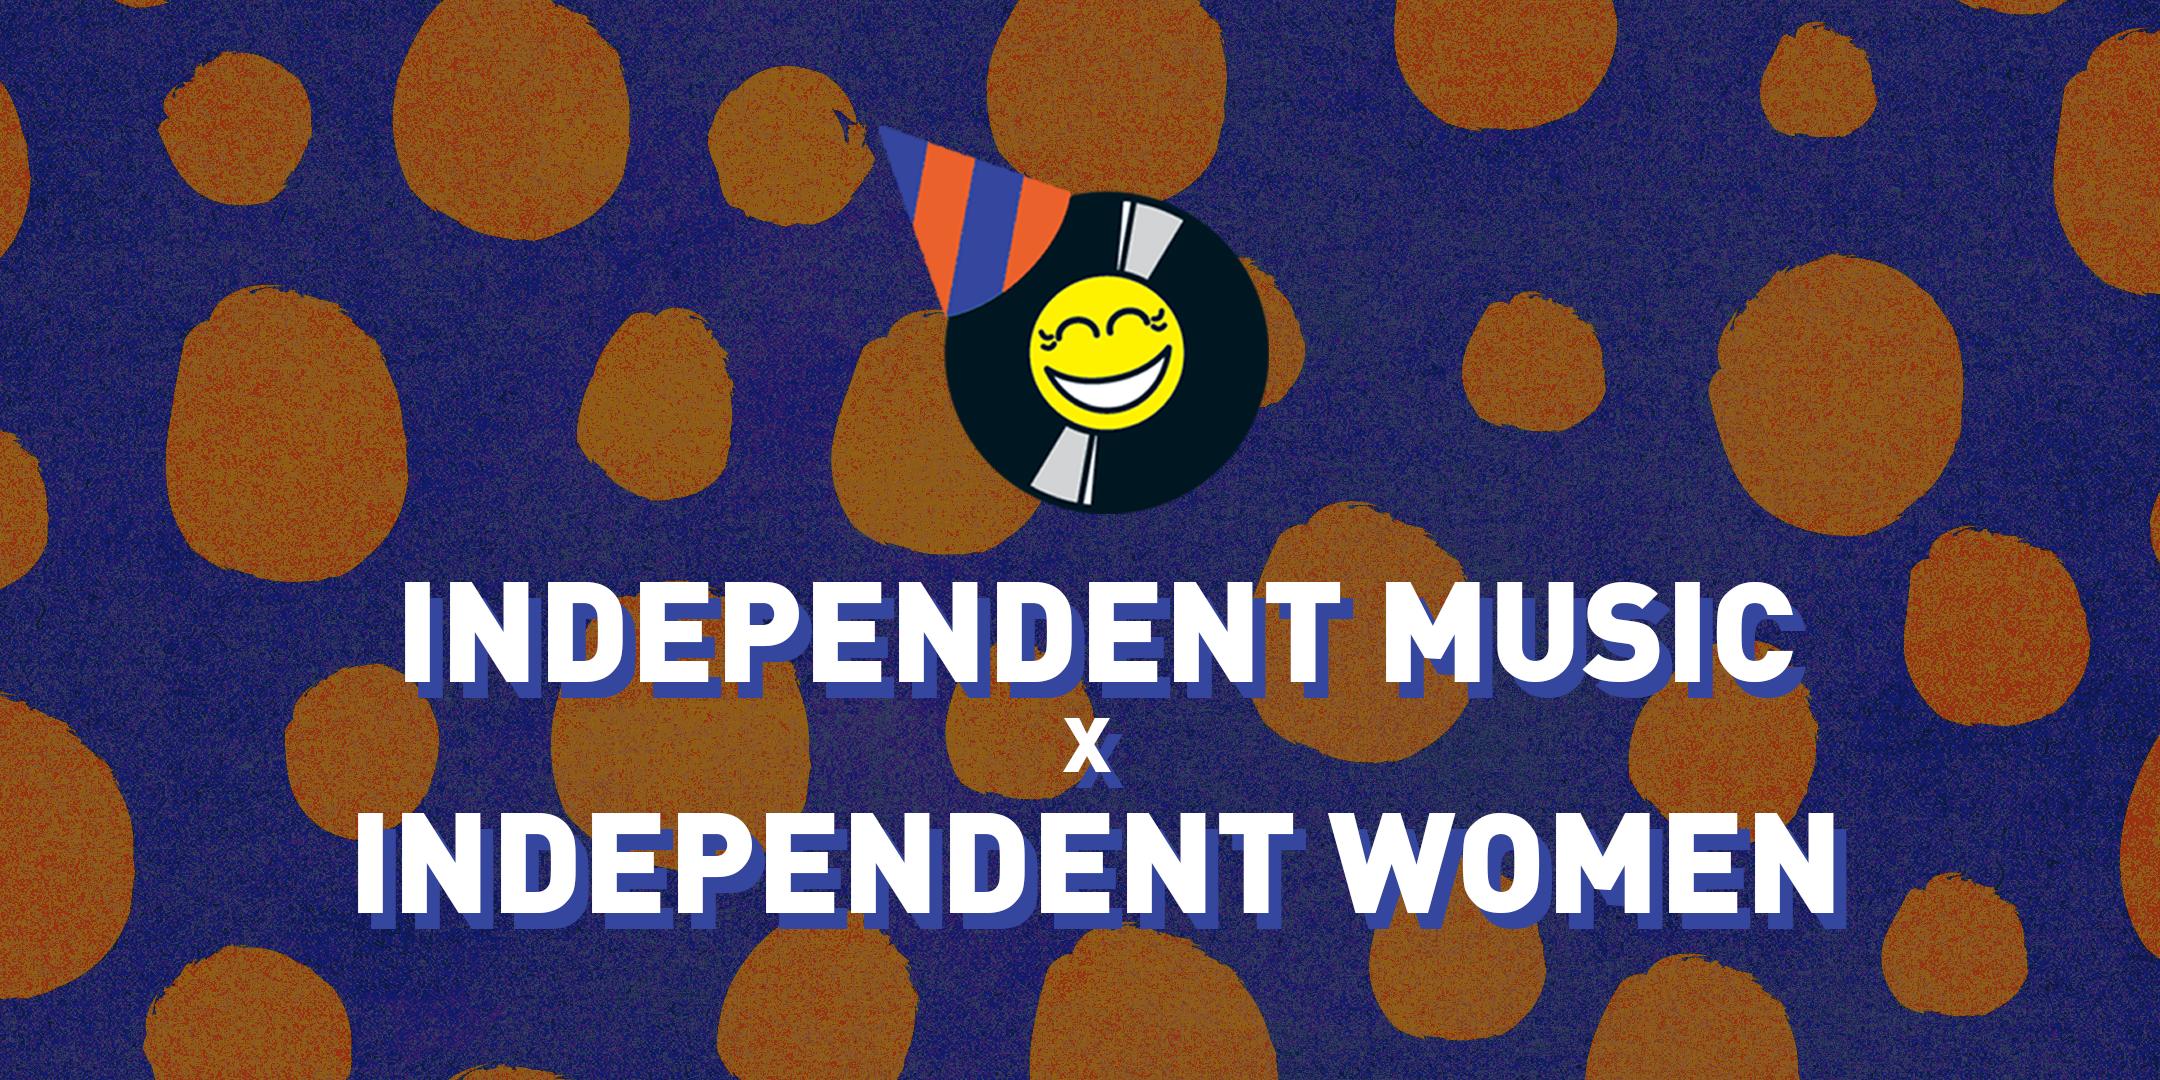 INDEPENDENT MUSIC x INDEPENDENT WOMEN